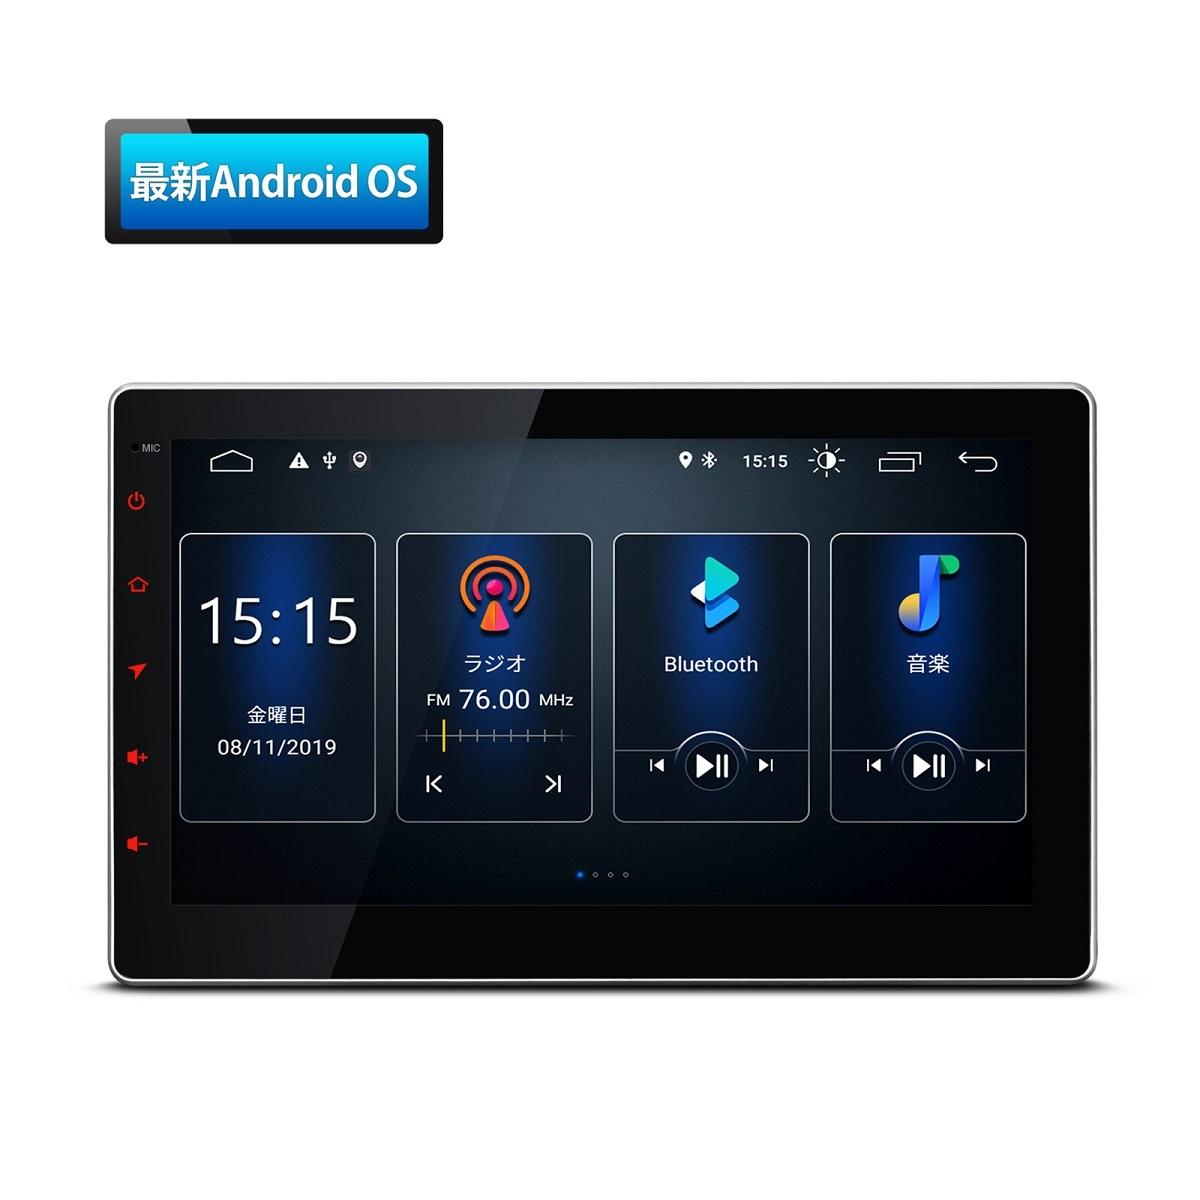 (TSD100L)XTRONS 10インチ 2DIN 静電式車載PC Android 高画質 カーステレオ カーオーディオ カーナビ 4G WIFI ミラーリング OBD2 DVR TPMS対応 全画面シェアー